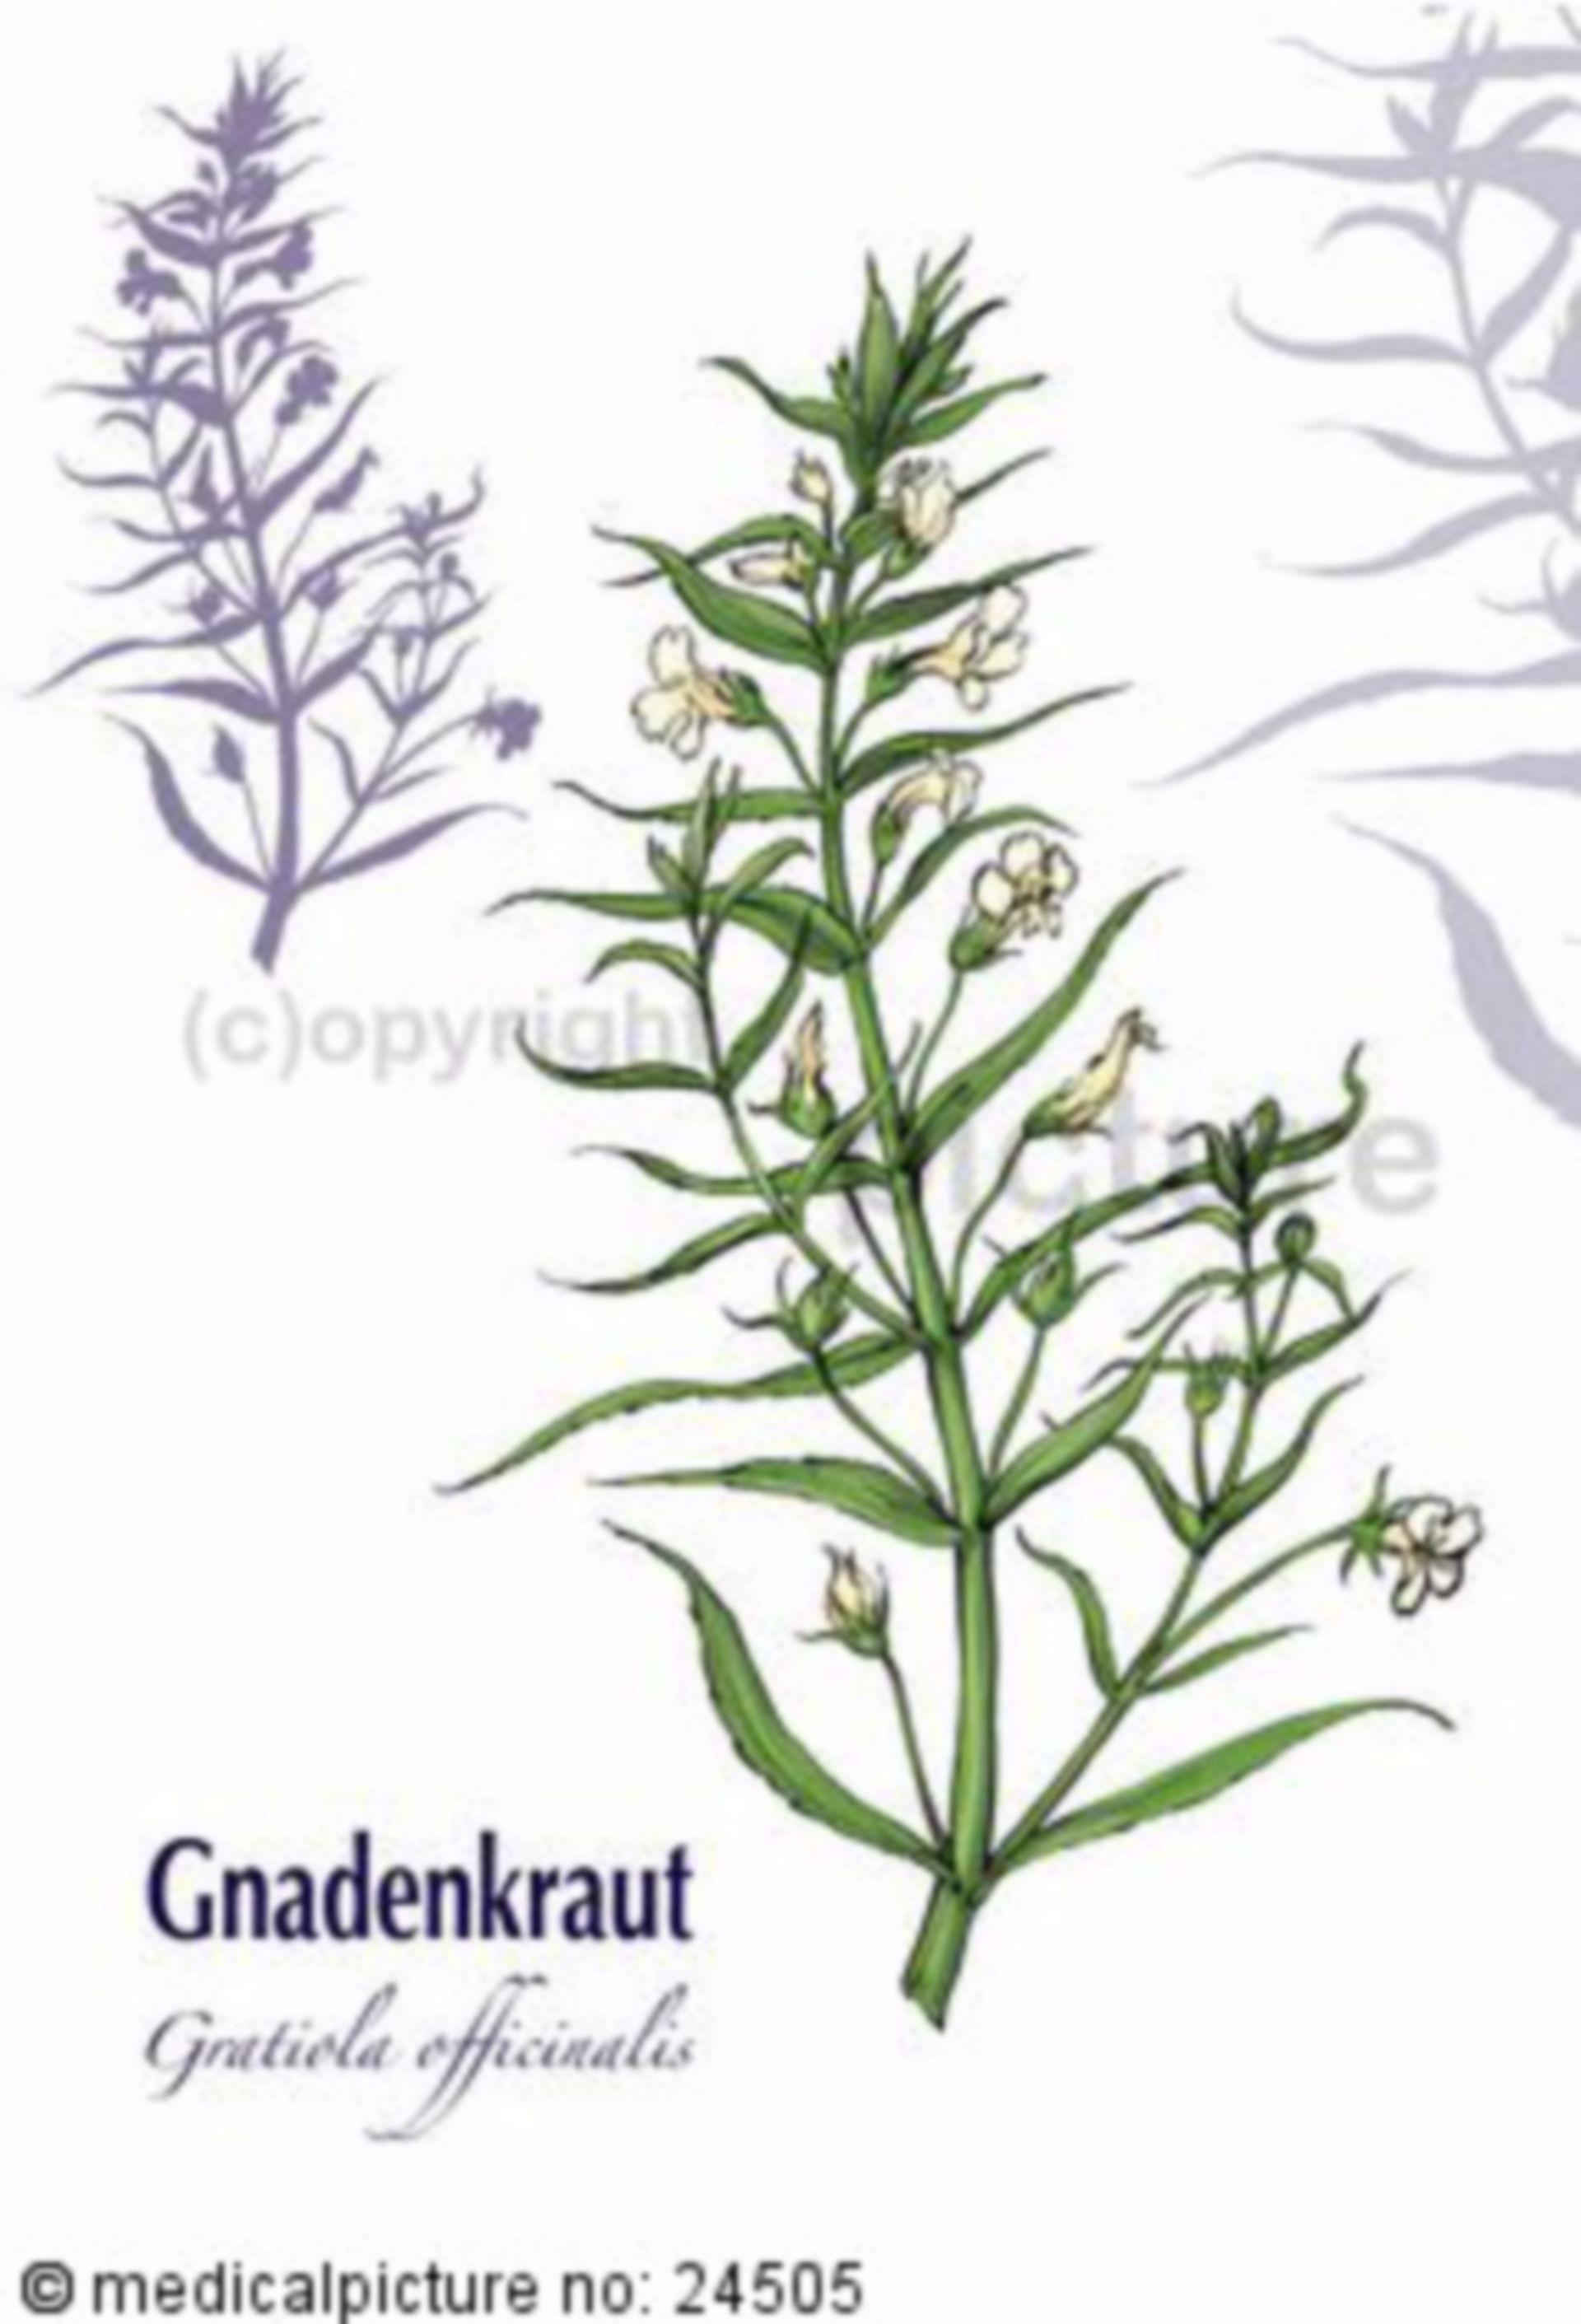 Gnadenkraut, Gratiola officinalis